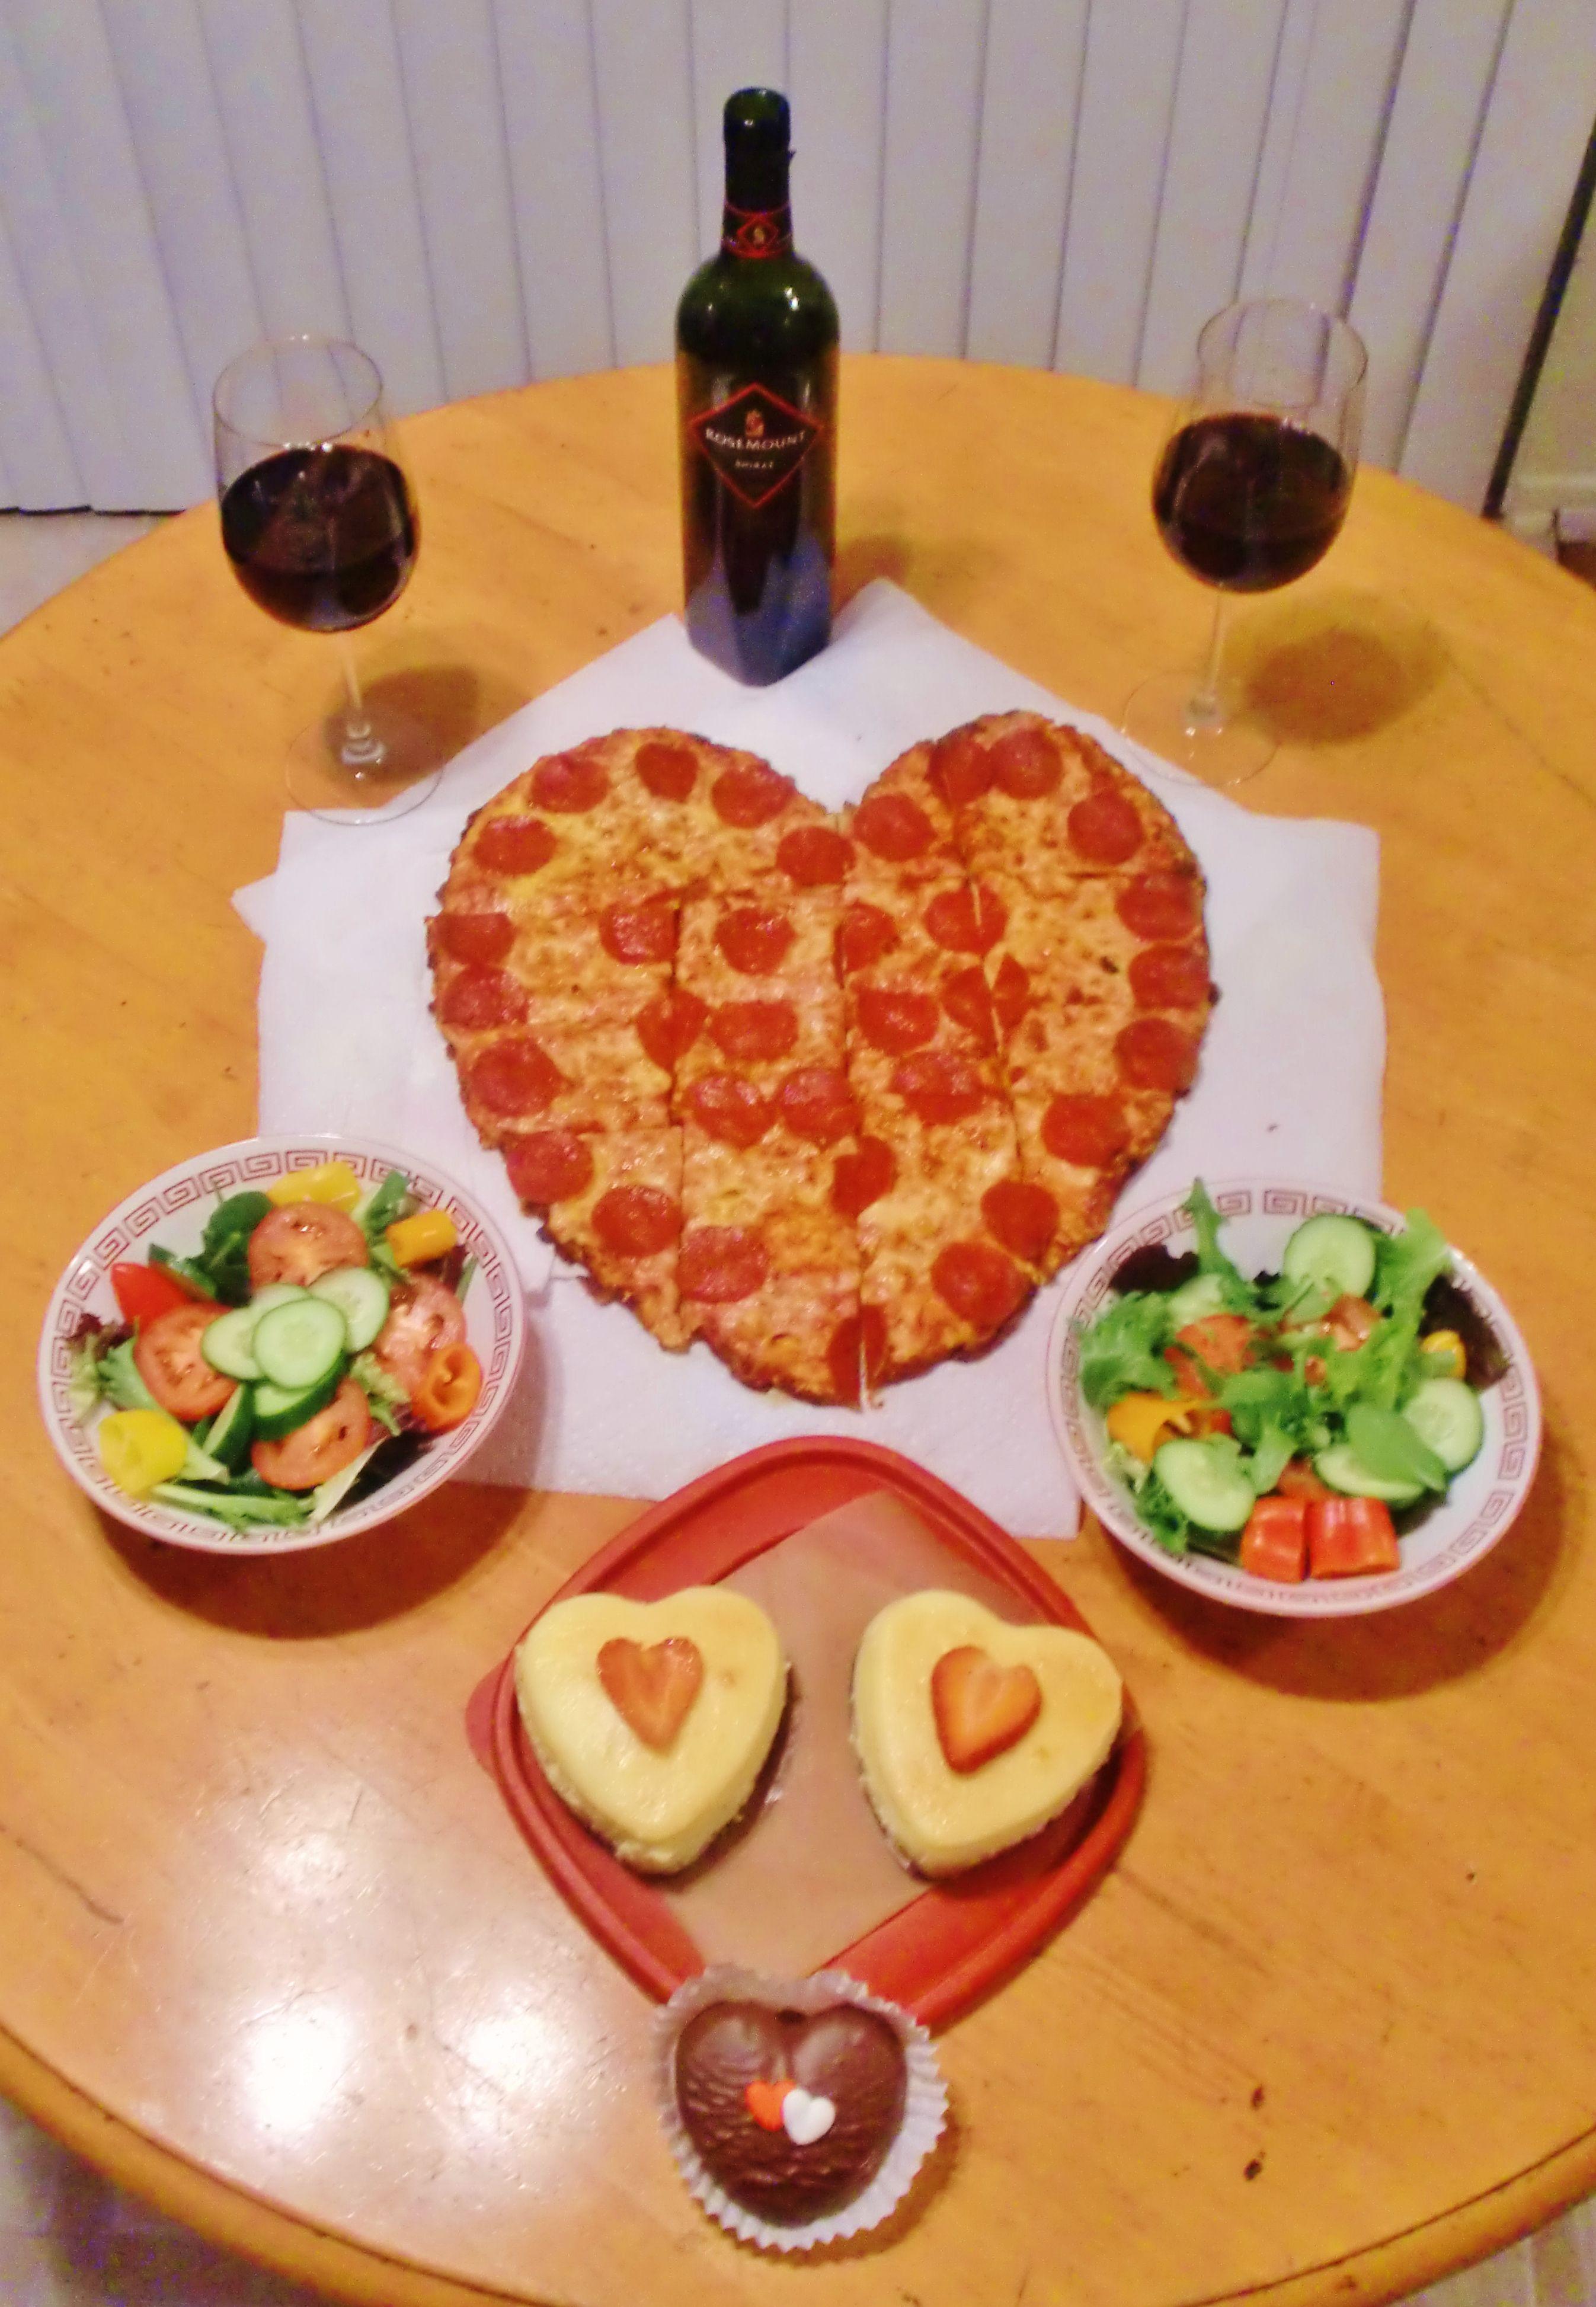 блюда на день святого валентина с фото нас